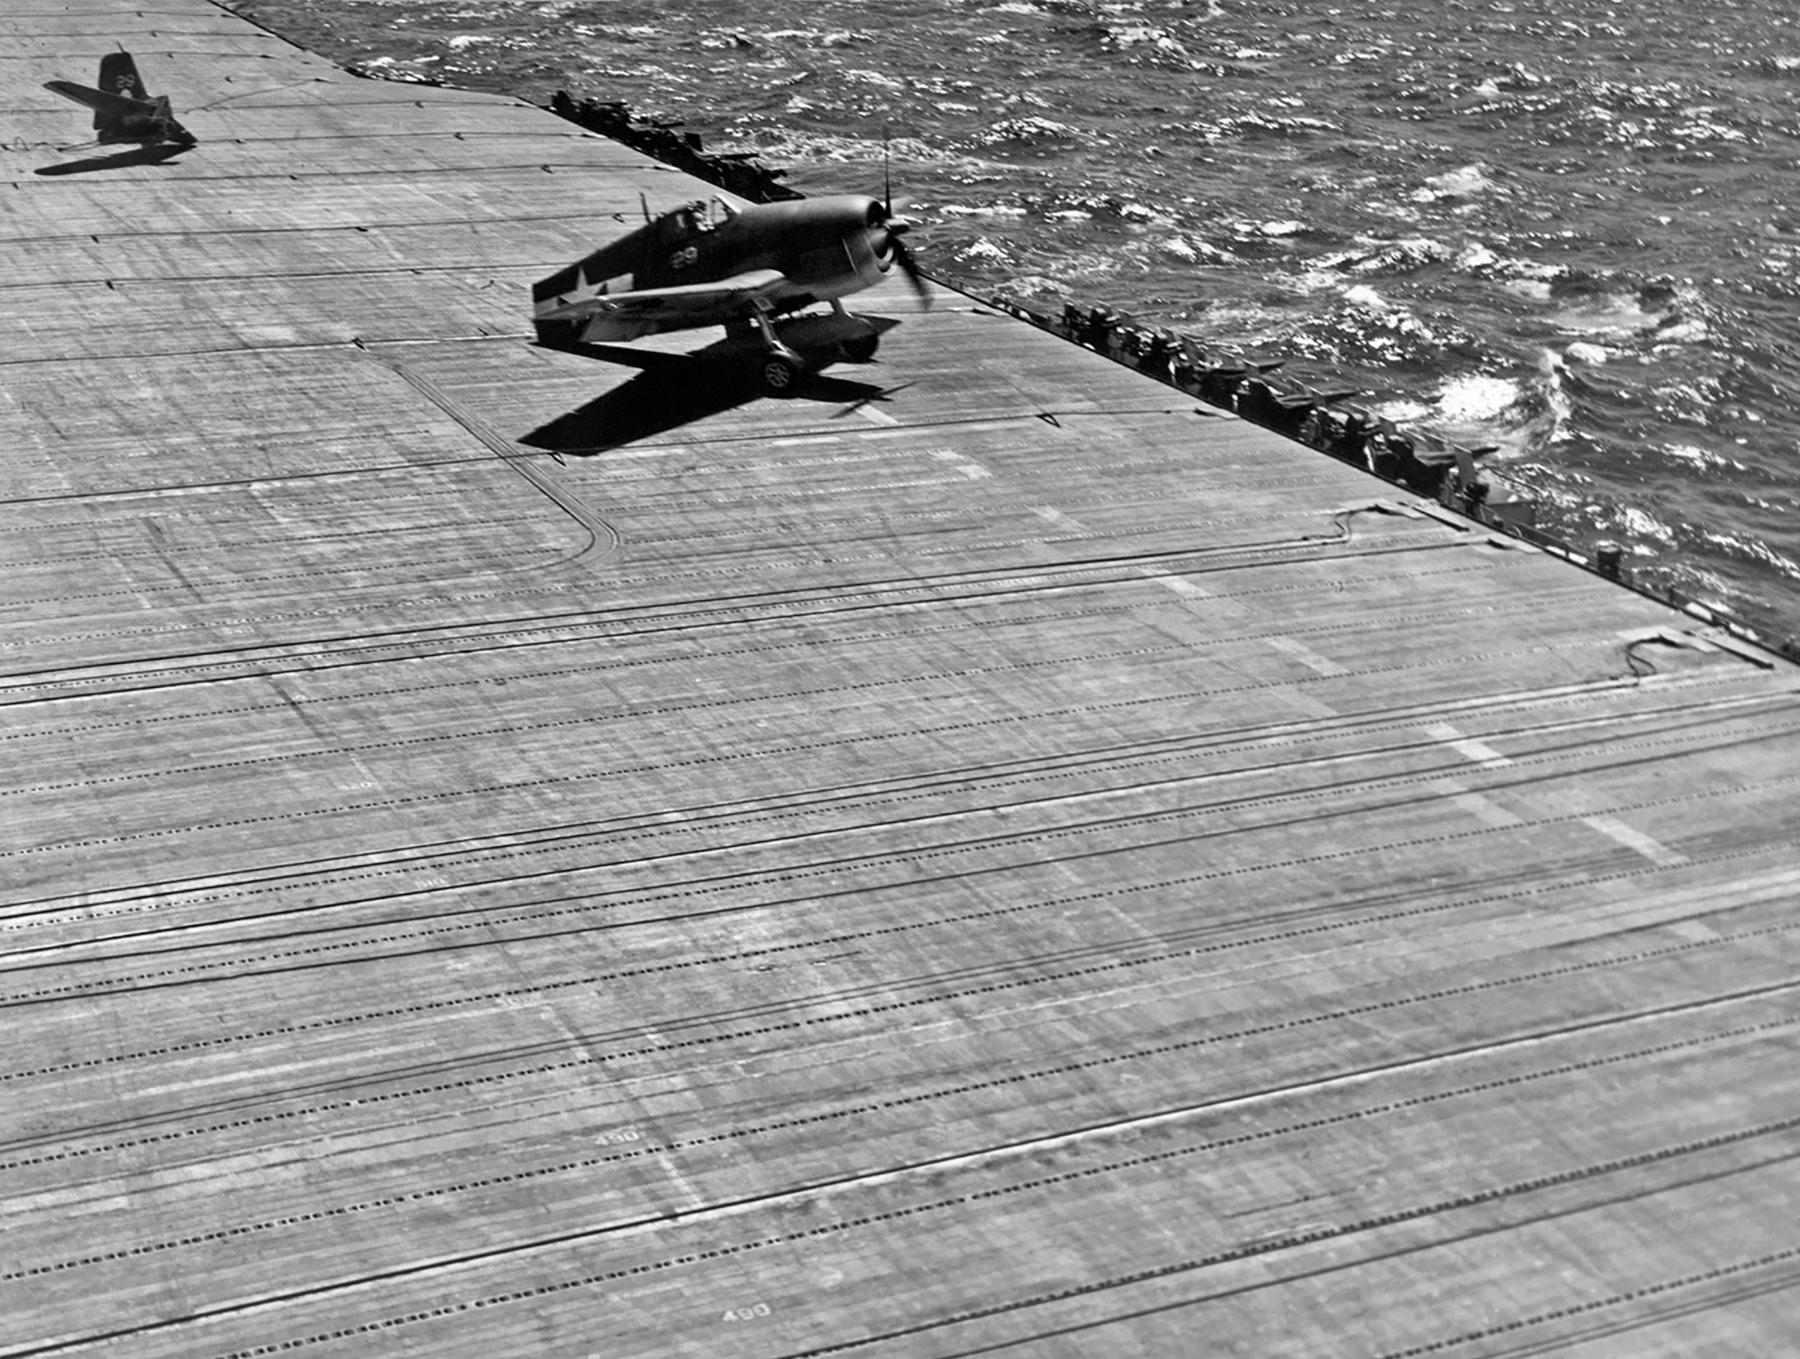 Grumman F6F 3 Hellcat VF 2 White 29 landing mishap tail broke off CV 12 USS Hornet Jun 1944 01